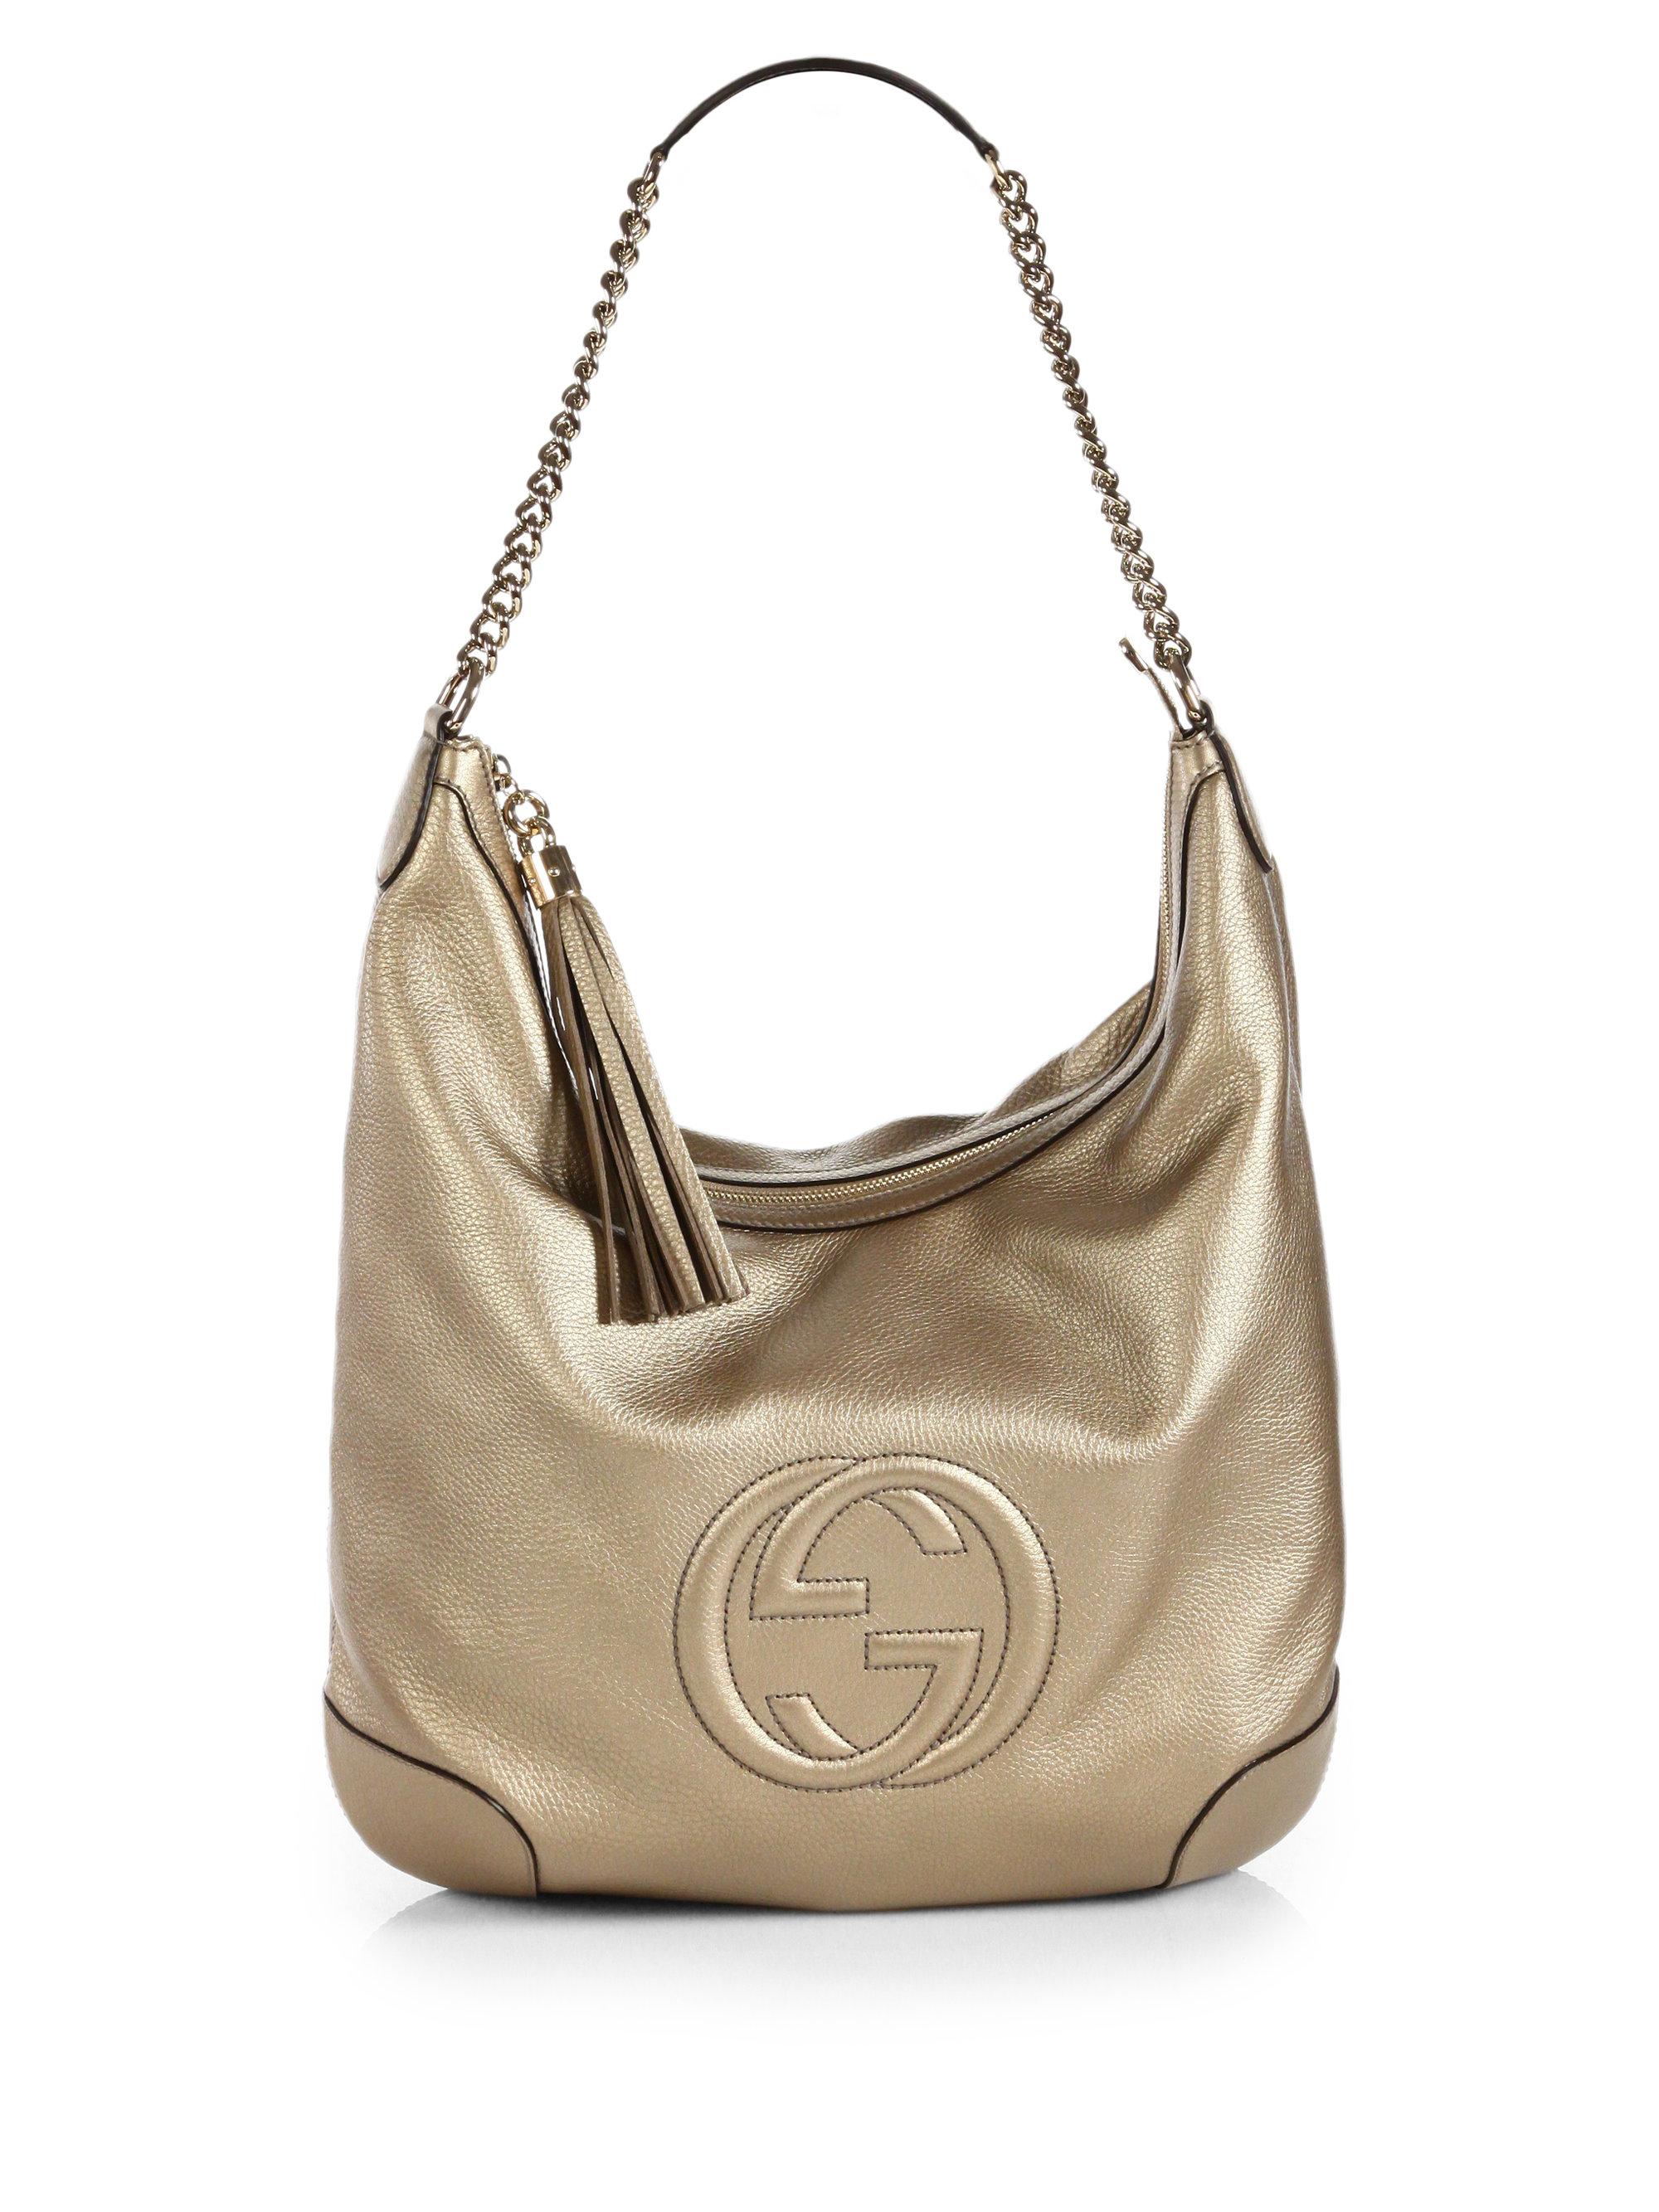 c0ca90caa18 Lyst - Gucci Soho Metallic Leather Chain Shoulder Bag in Metallic